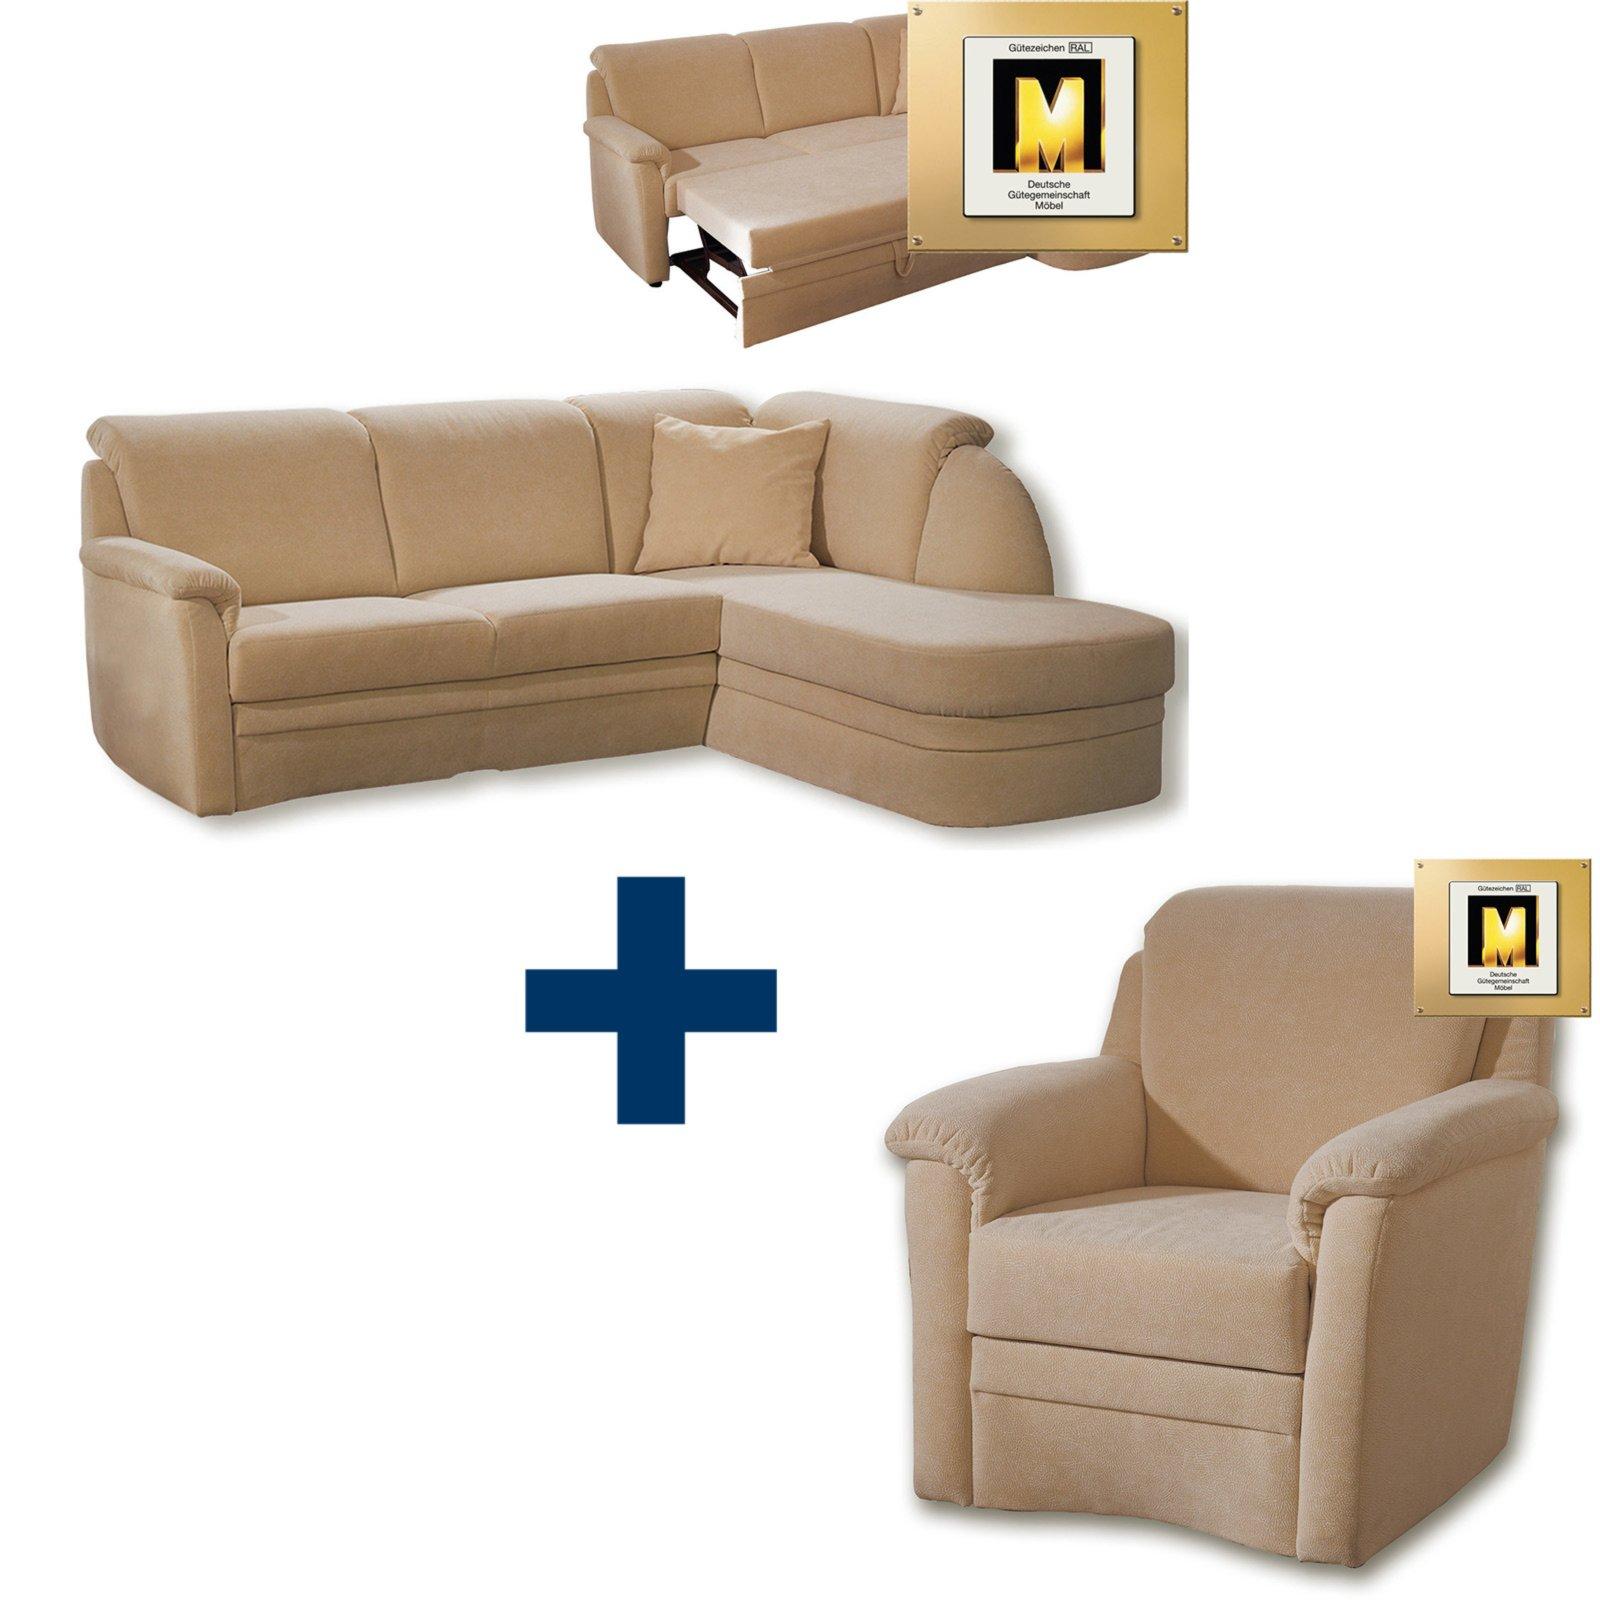 set freiburg ecksofa mit sessel beige mit. Black Bedroom Furniture Sets. Home Design Ideas